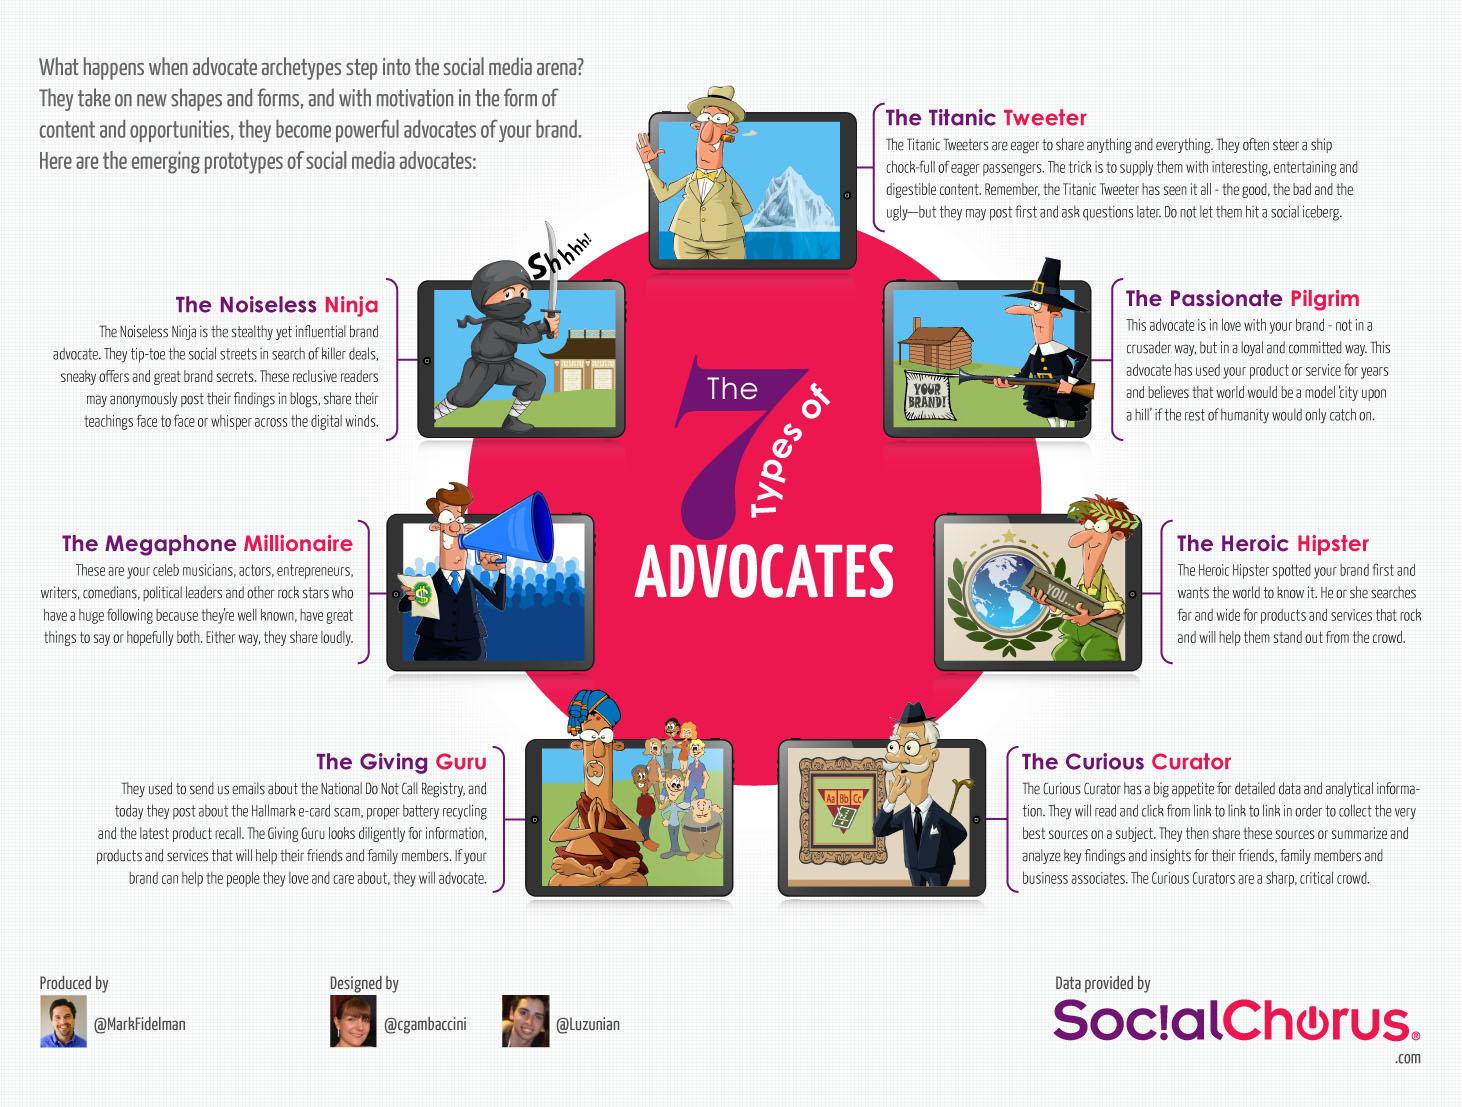 7 Prototypes Of Social Media Advocates [infographic]